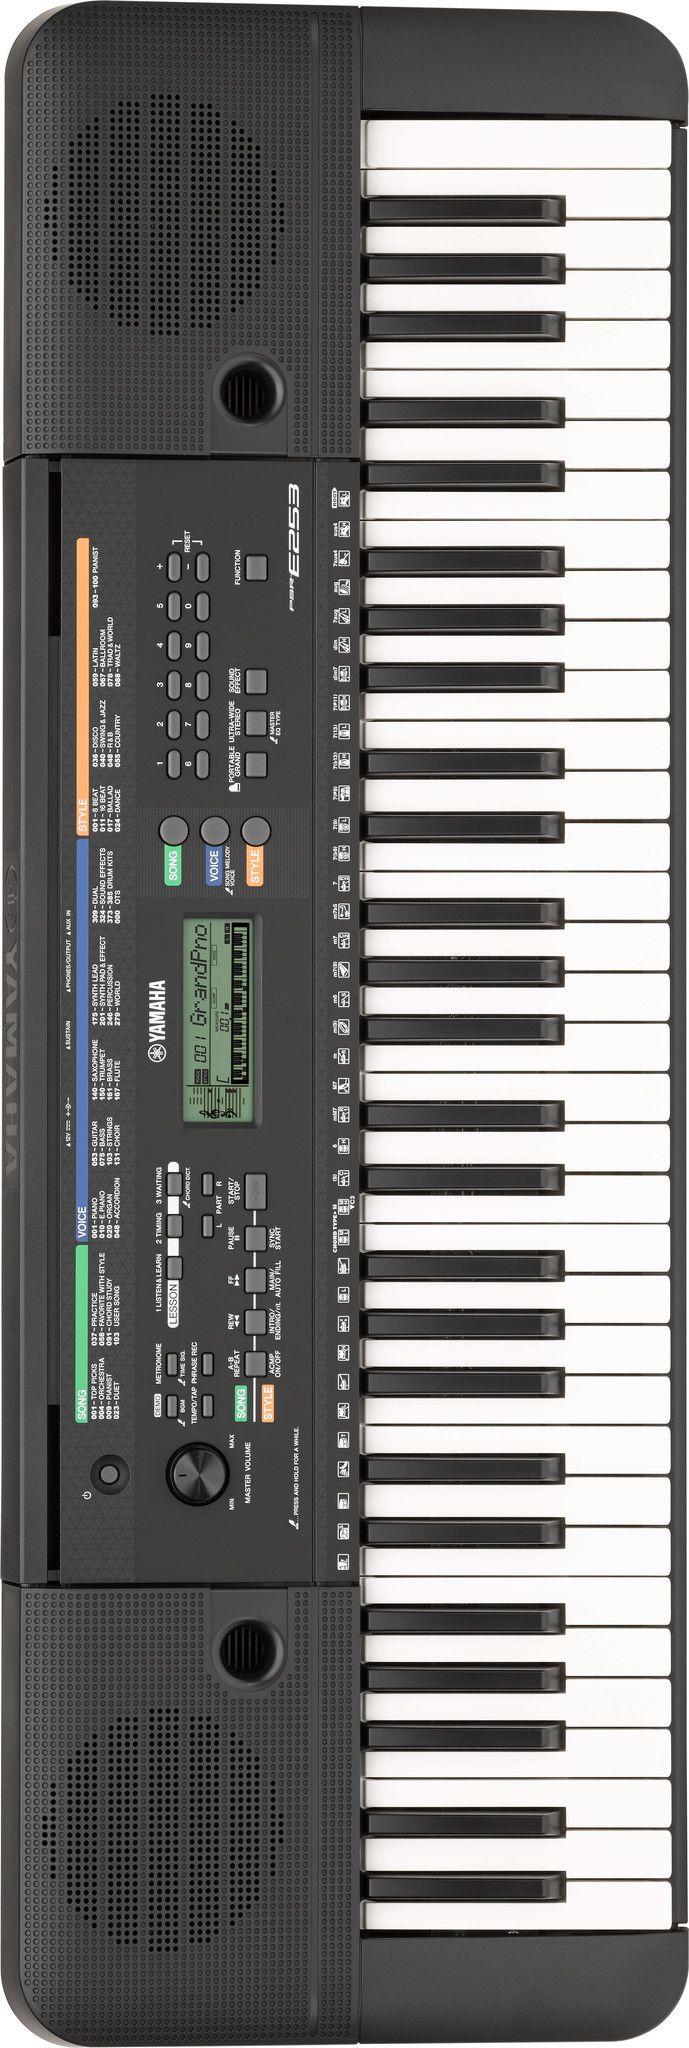 Yamaha Keyboard Lessons Pdf